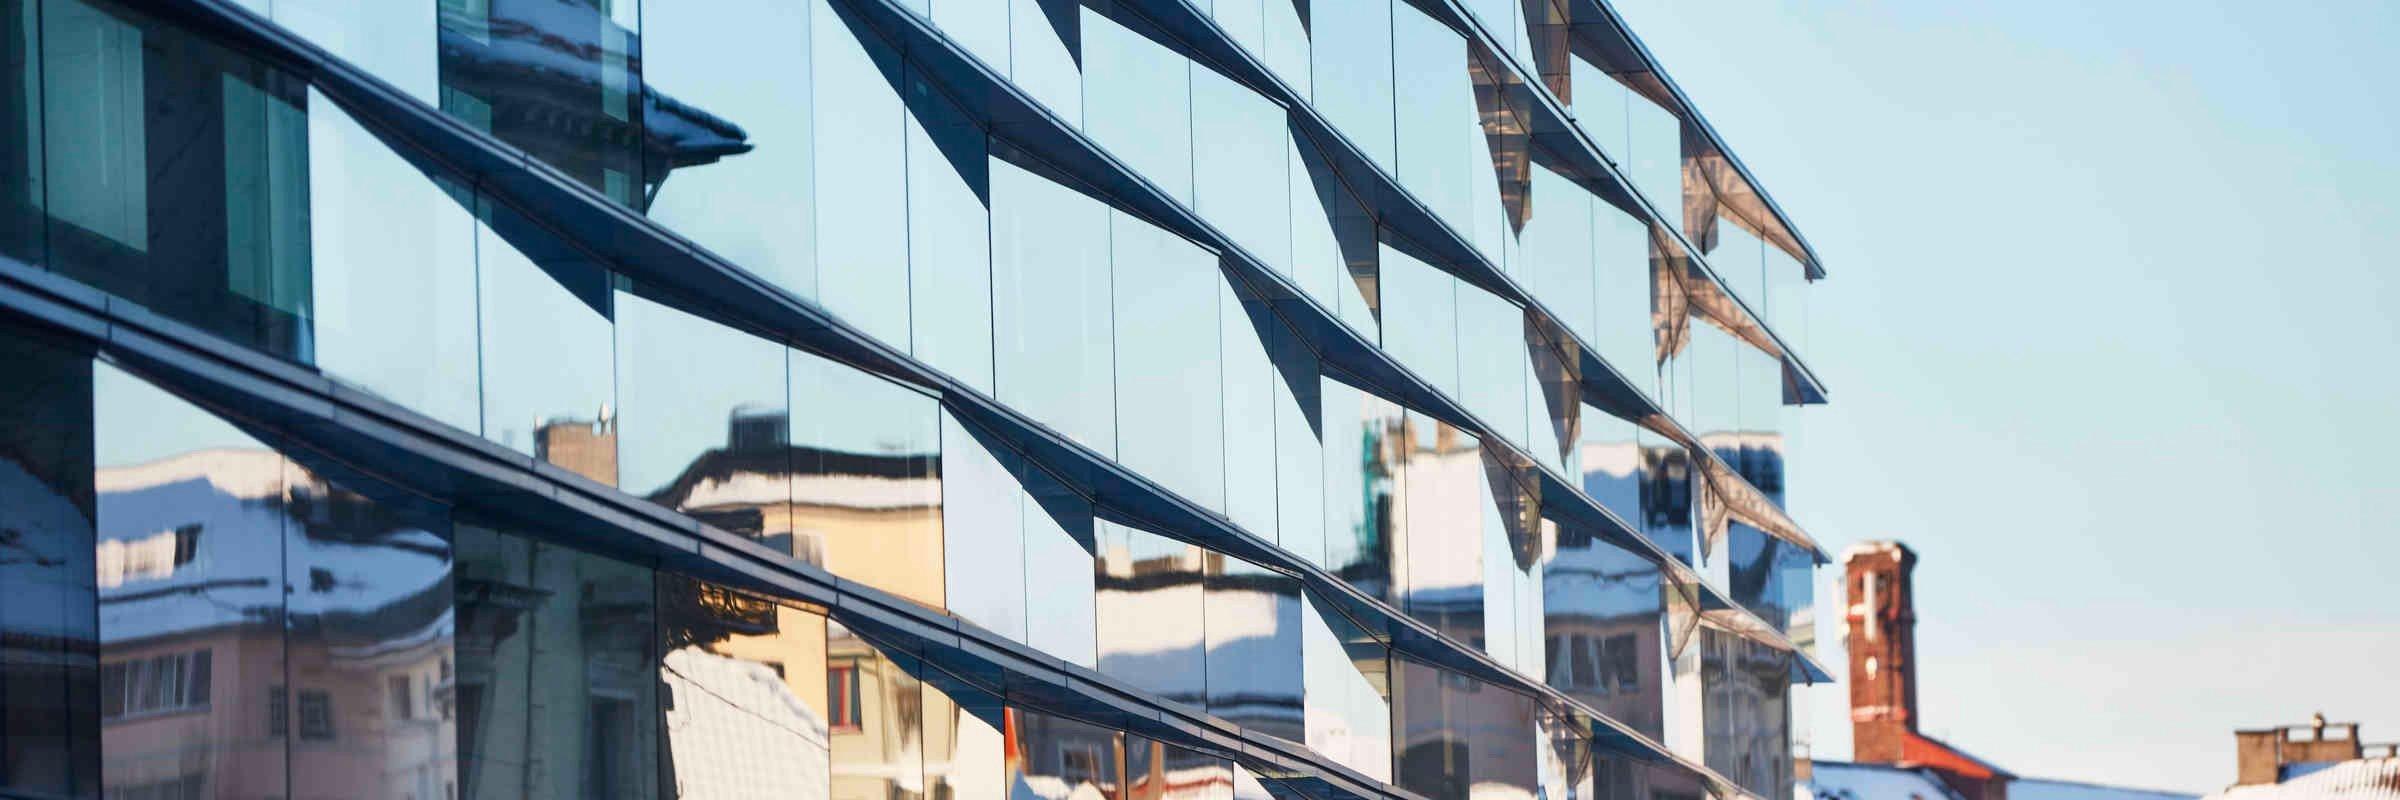 sandane-glassfasader